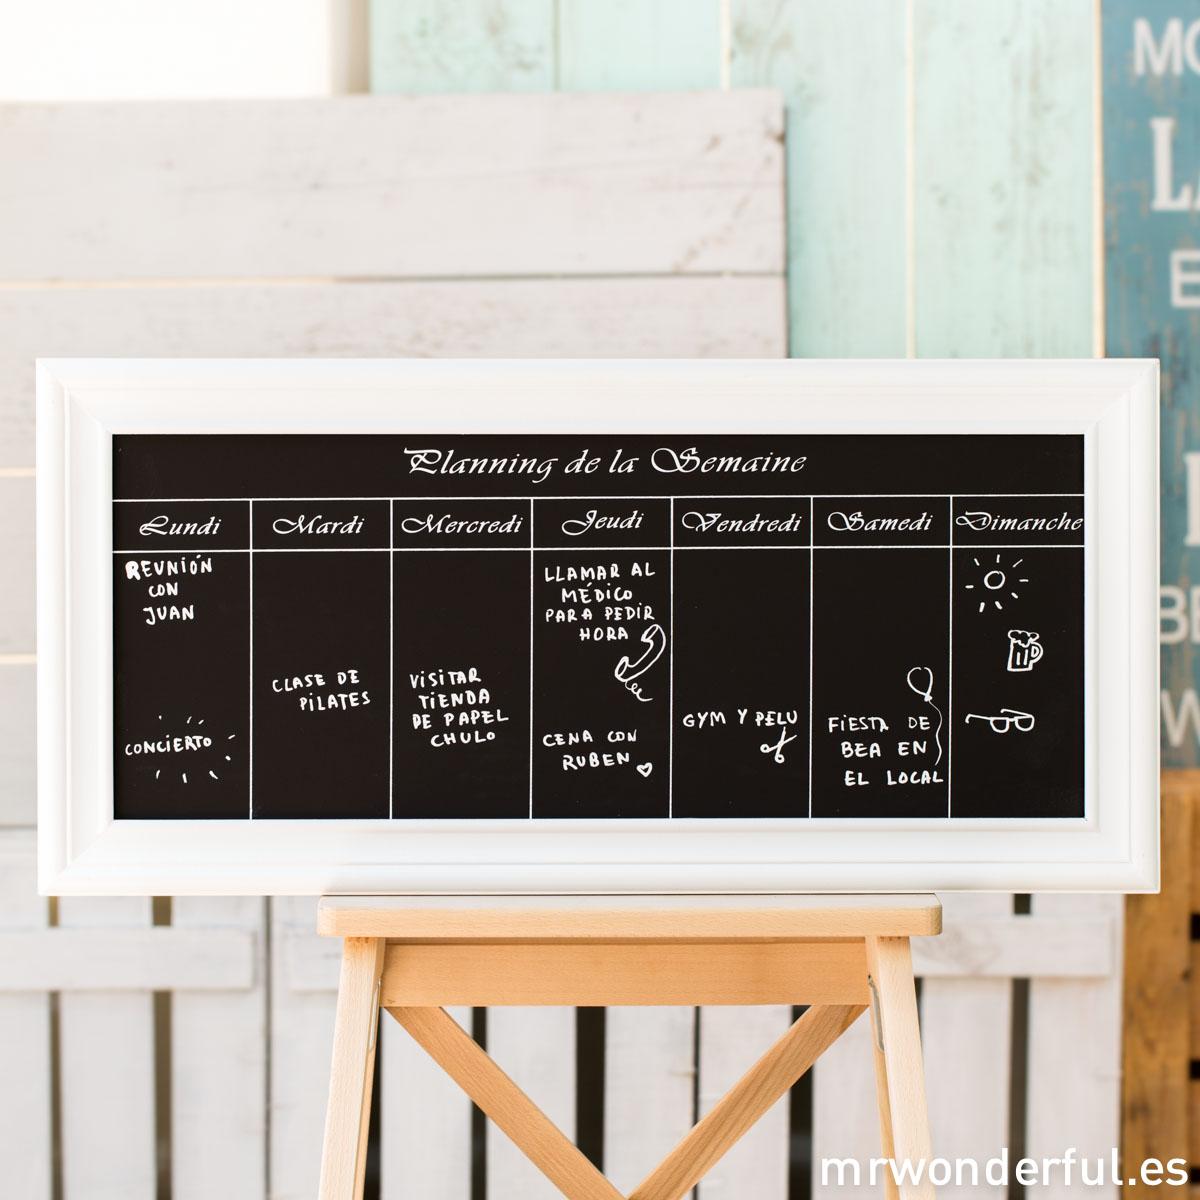 mrwonderful_KI5824_2_pizarra-marco-madera-blanca_planning-semanal-1